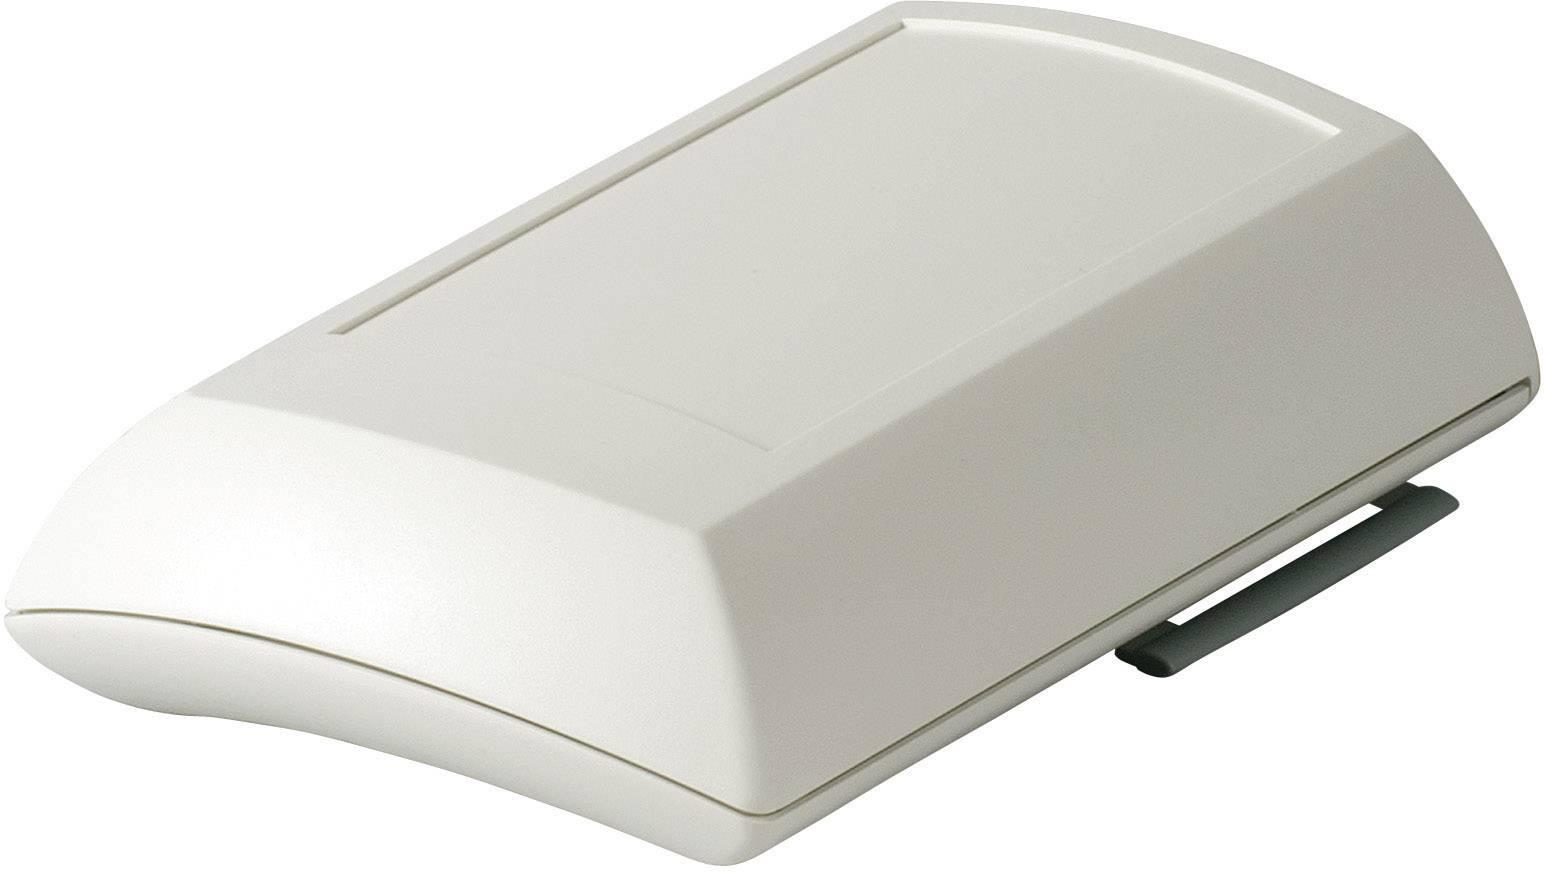 Plastová krabička OKW ERGO-CASE D7010207, 150 x 100 x 40 mm, ABS, IP40, sivobiela, 1 ks